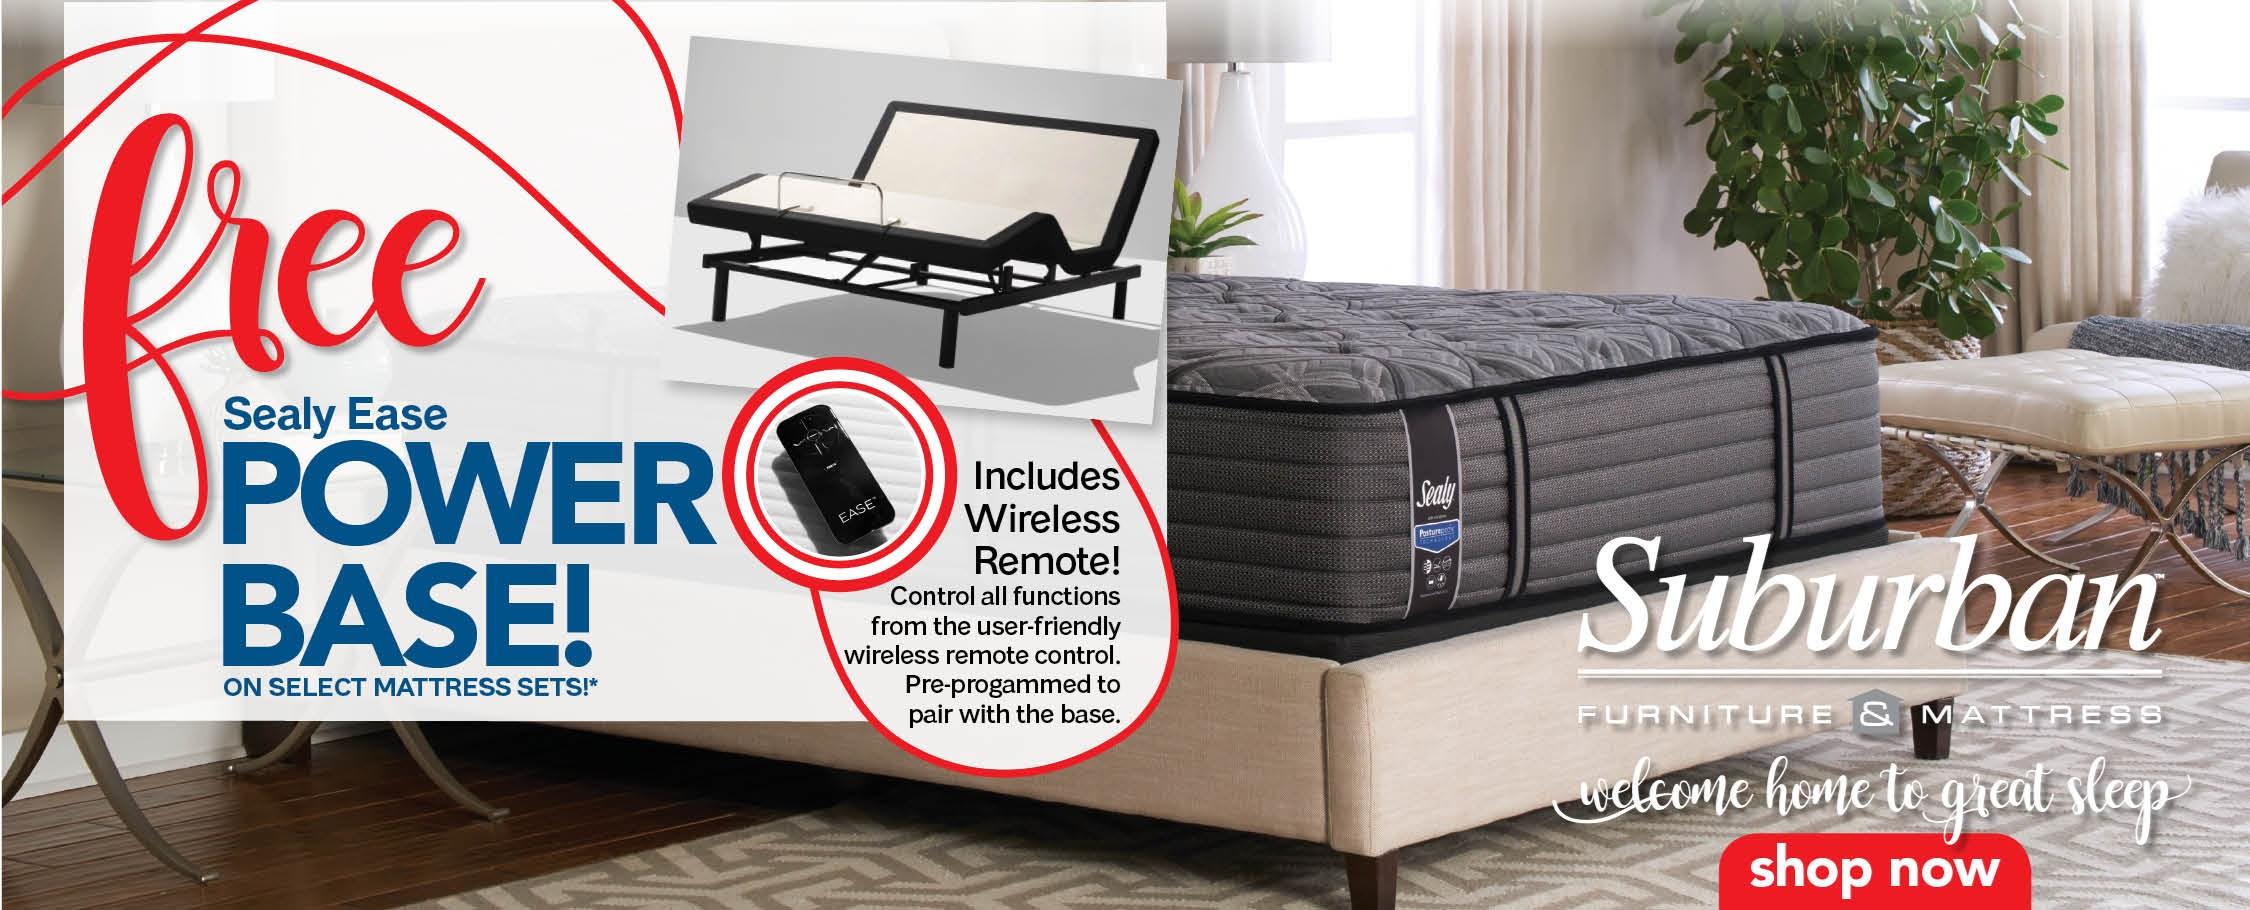 Free Sealy Ease power base on select mattress sets